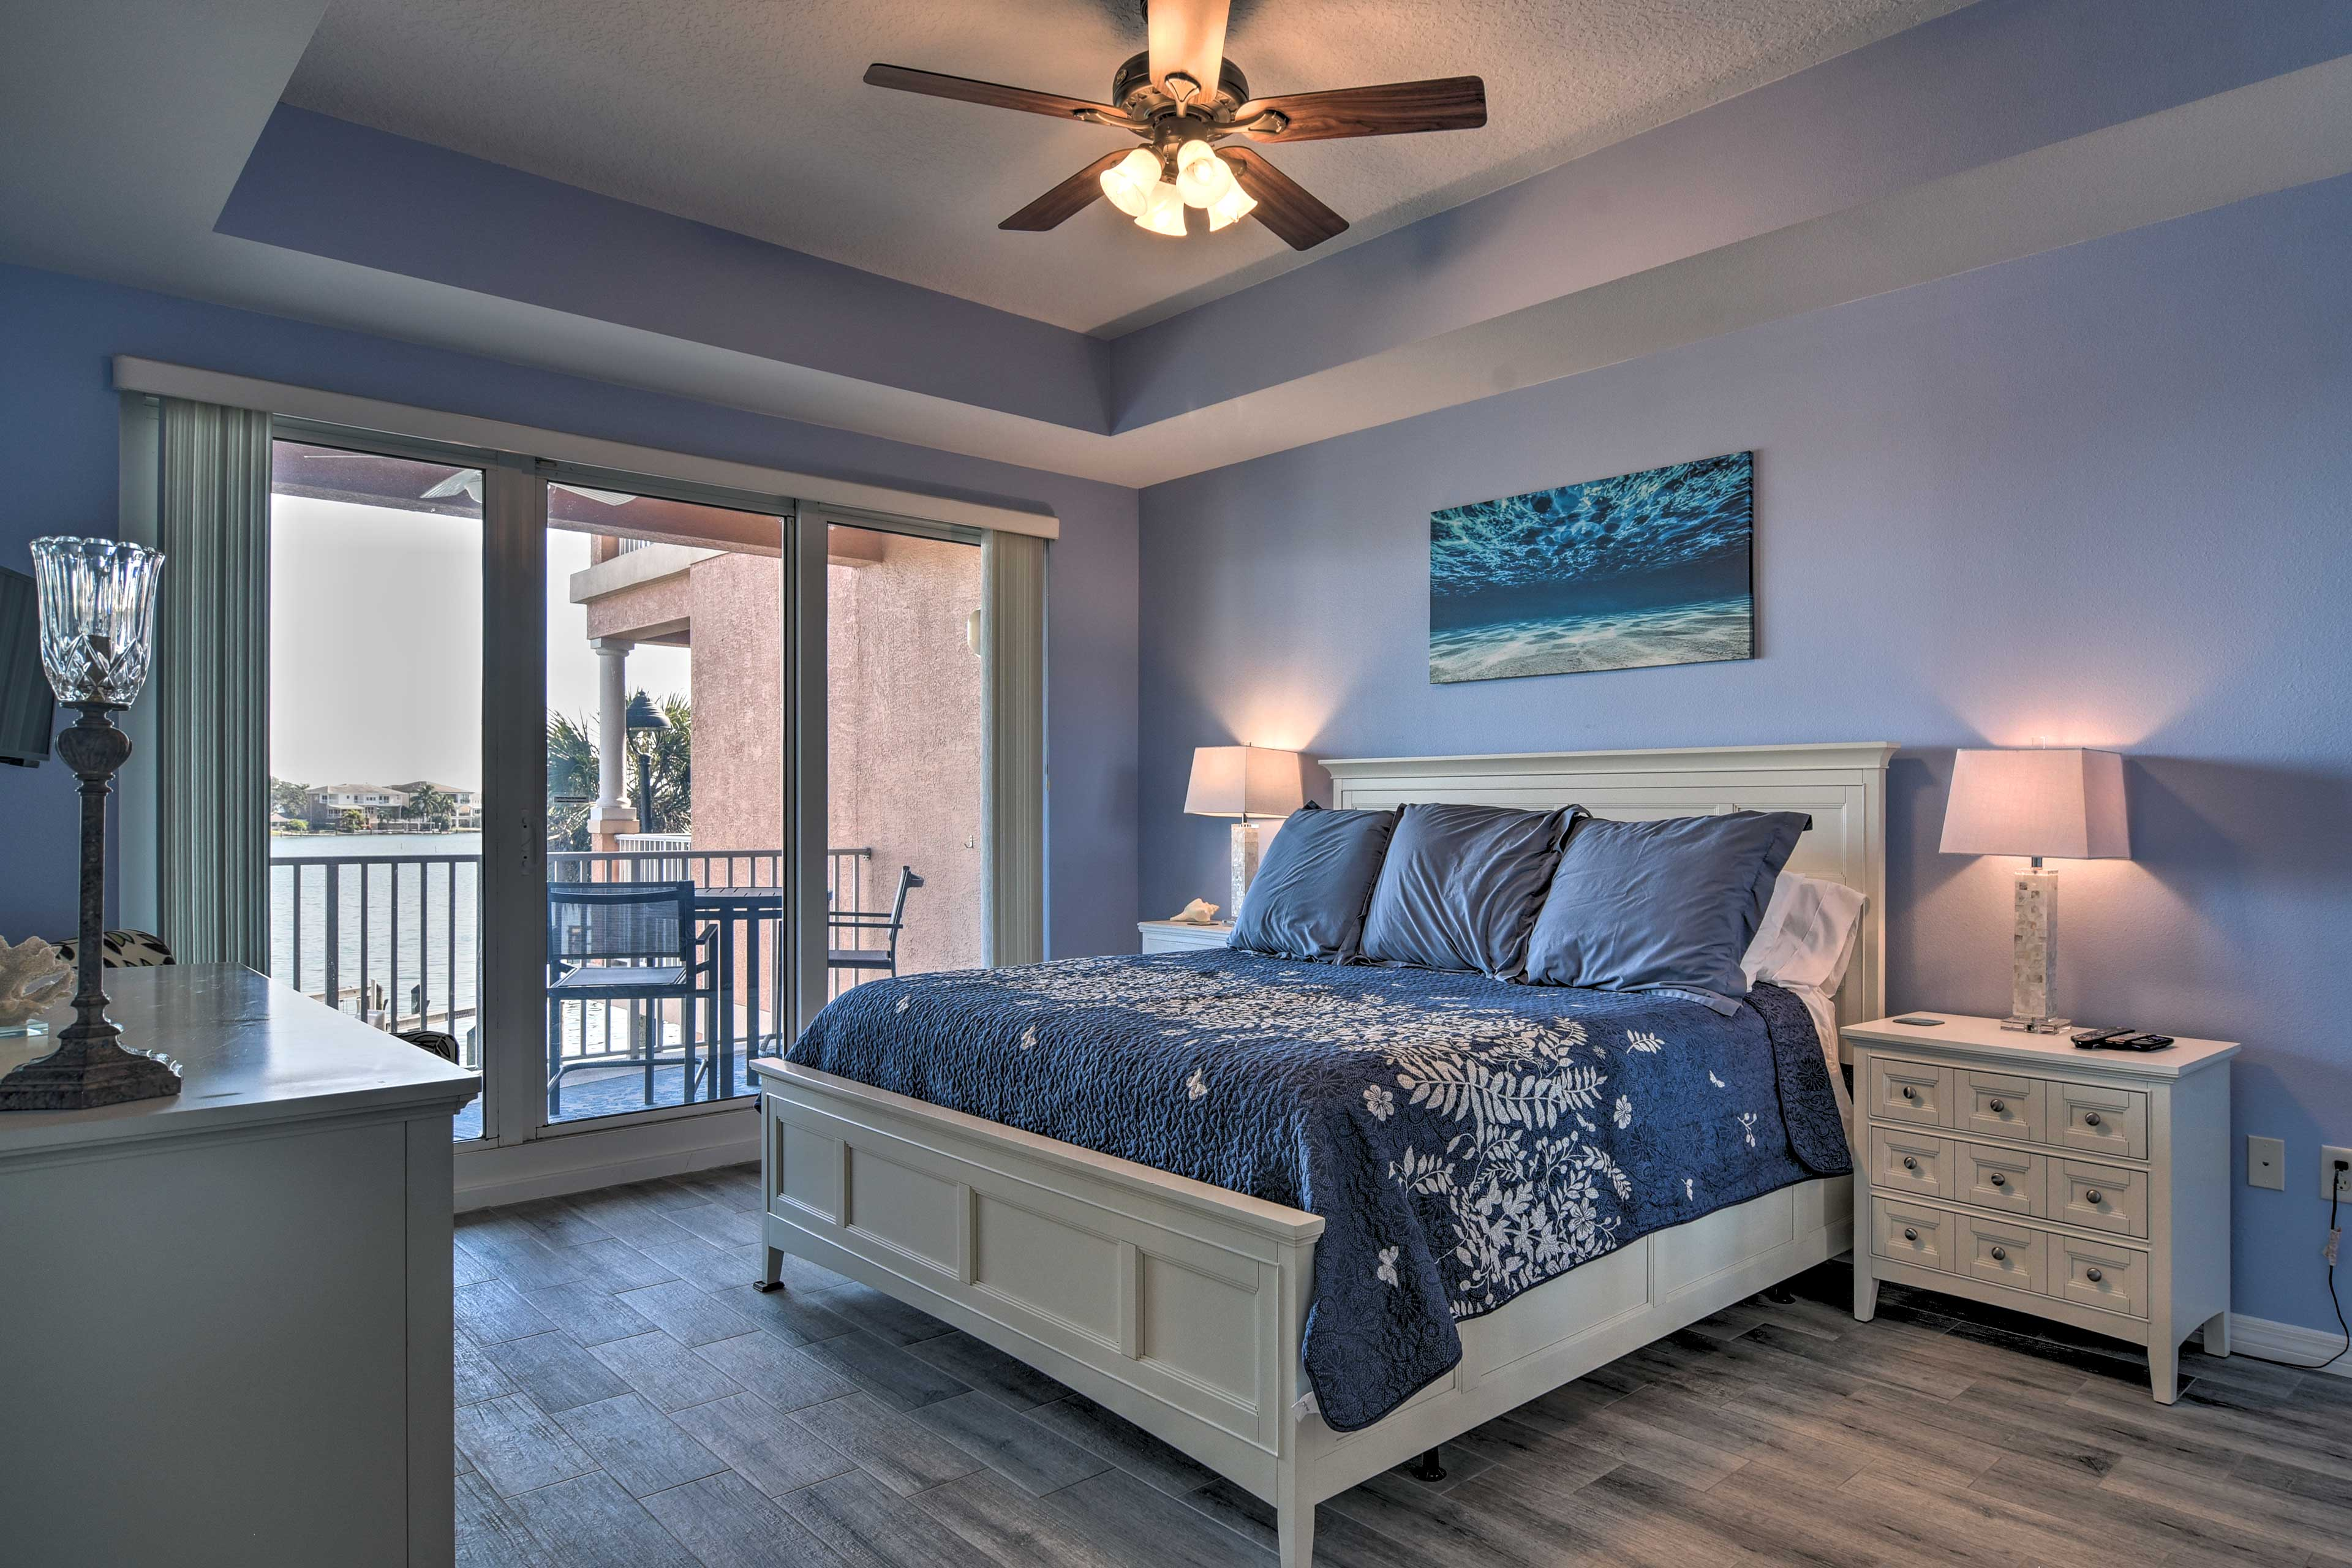 Bedroom | Tempur-Pedic King Bed | Linens Provided